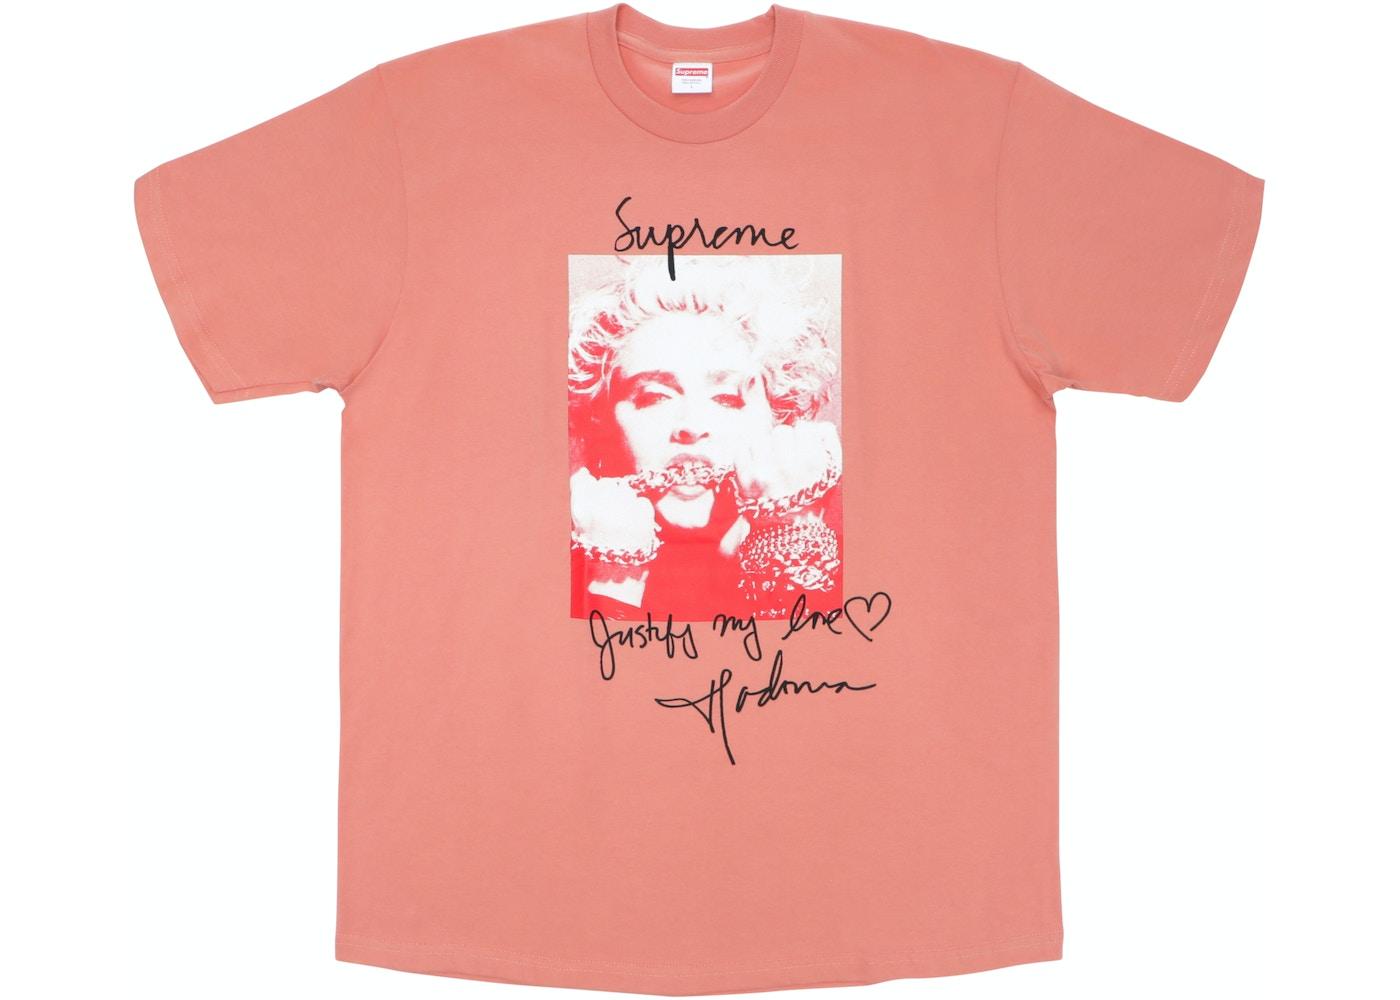 5a32c10e1 Supreme Madonna Tee Terra Cotta - FW18